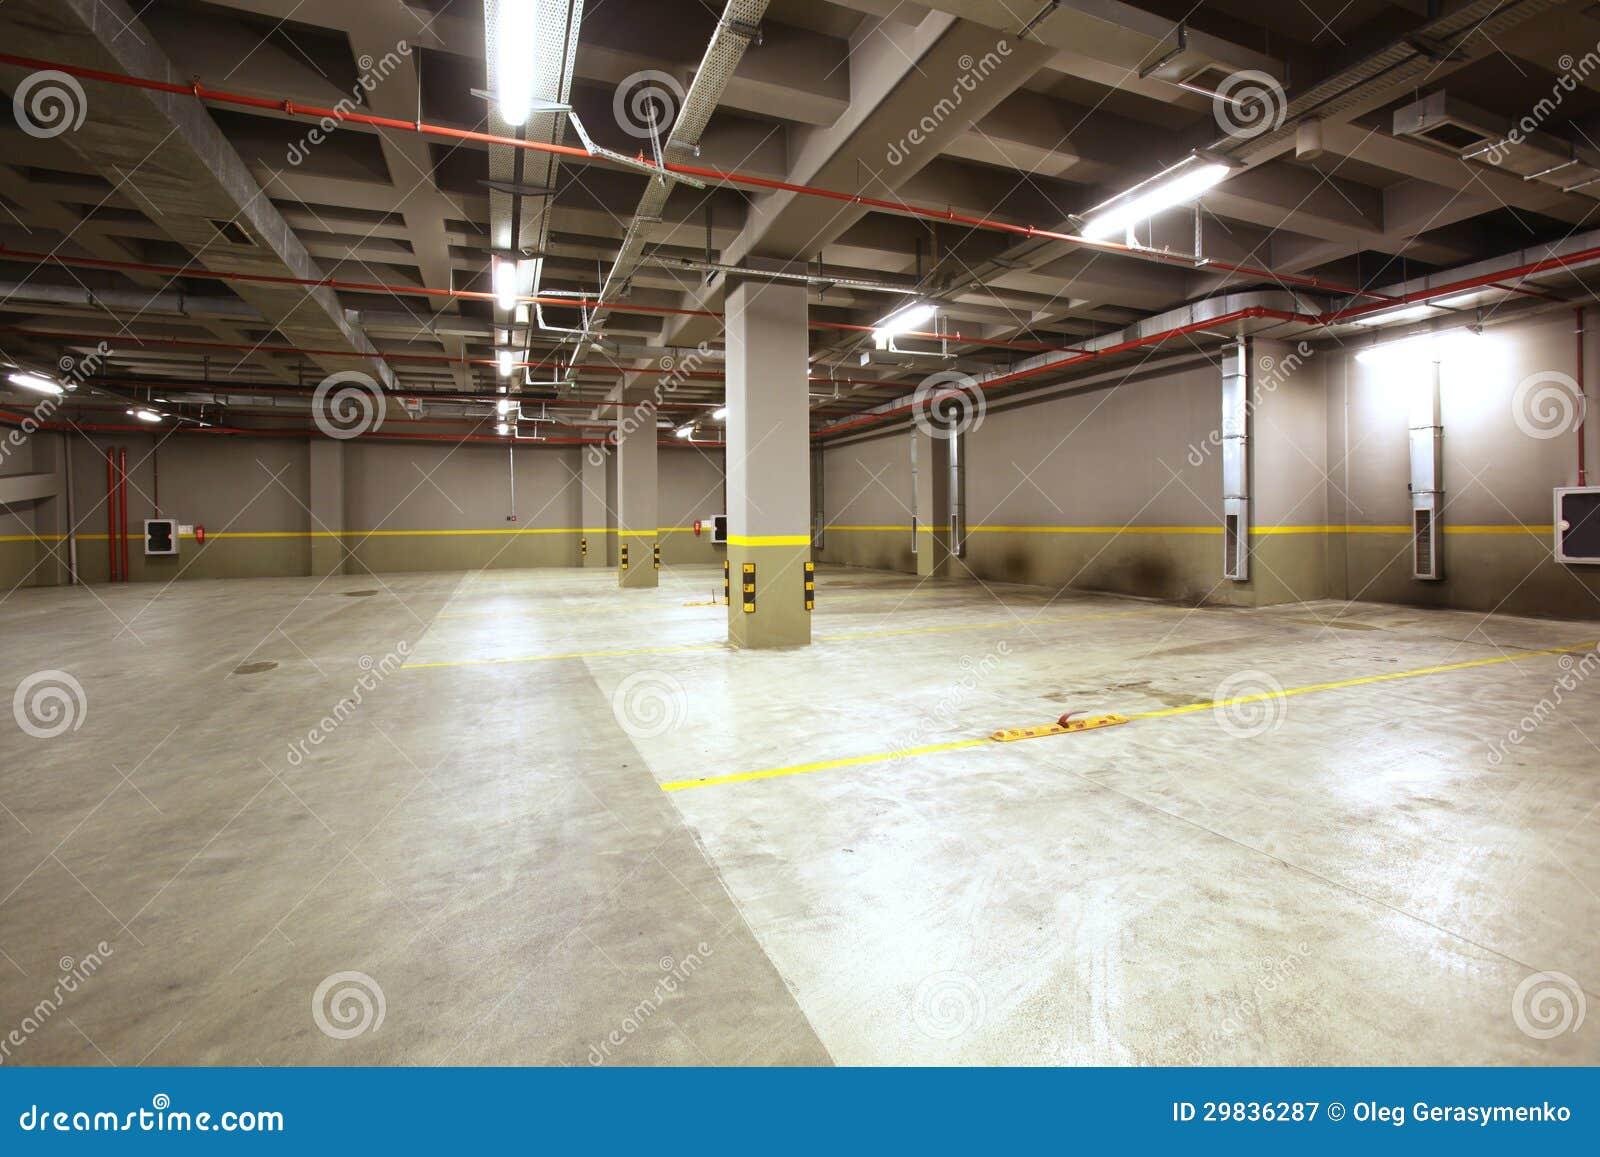 Parking Garage Interior Stock Image Image Of Column